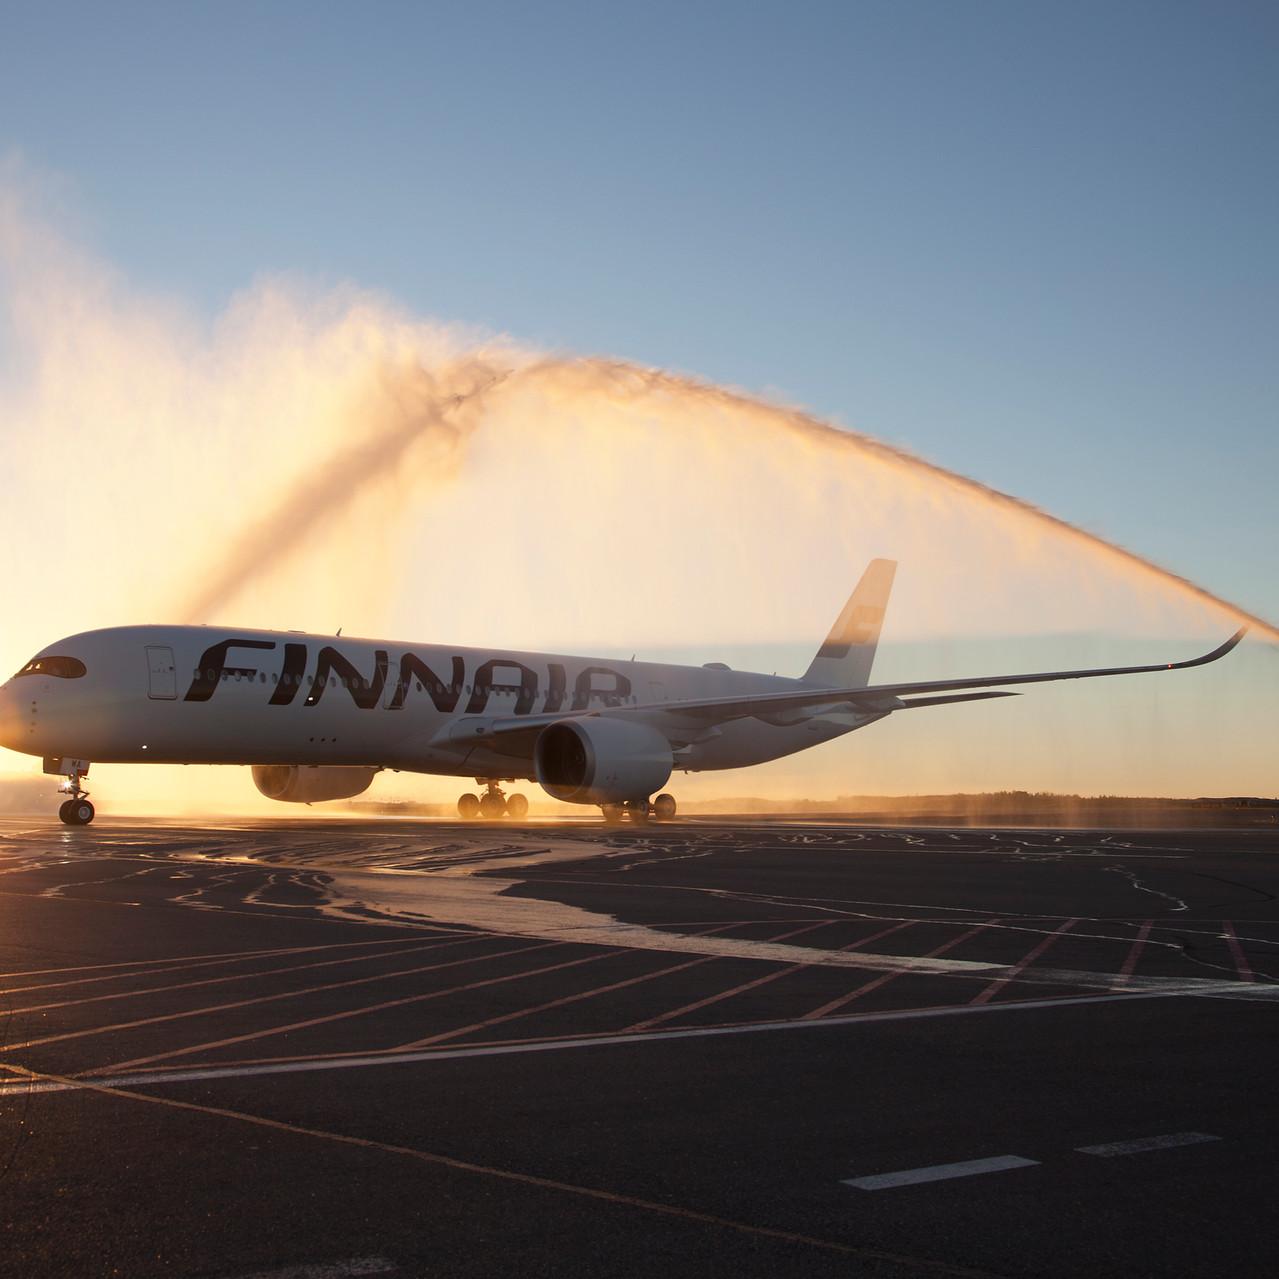 001_A350 XWB delovery arriving in Finlan